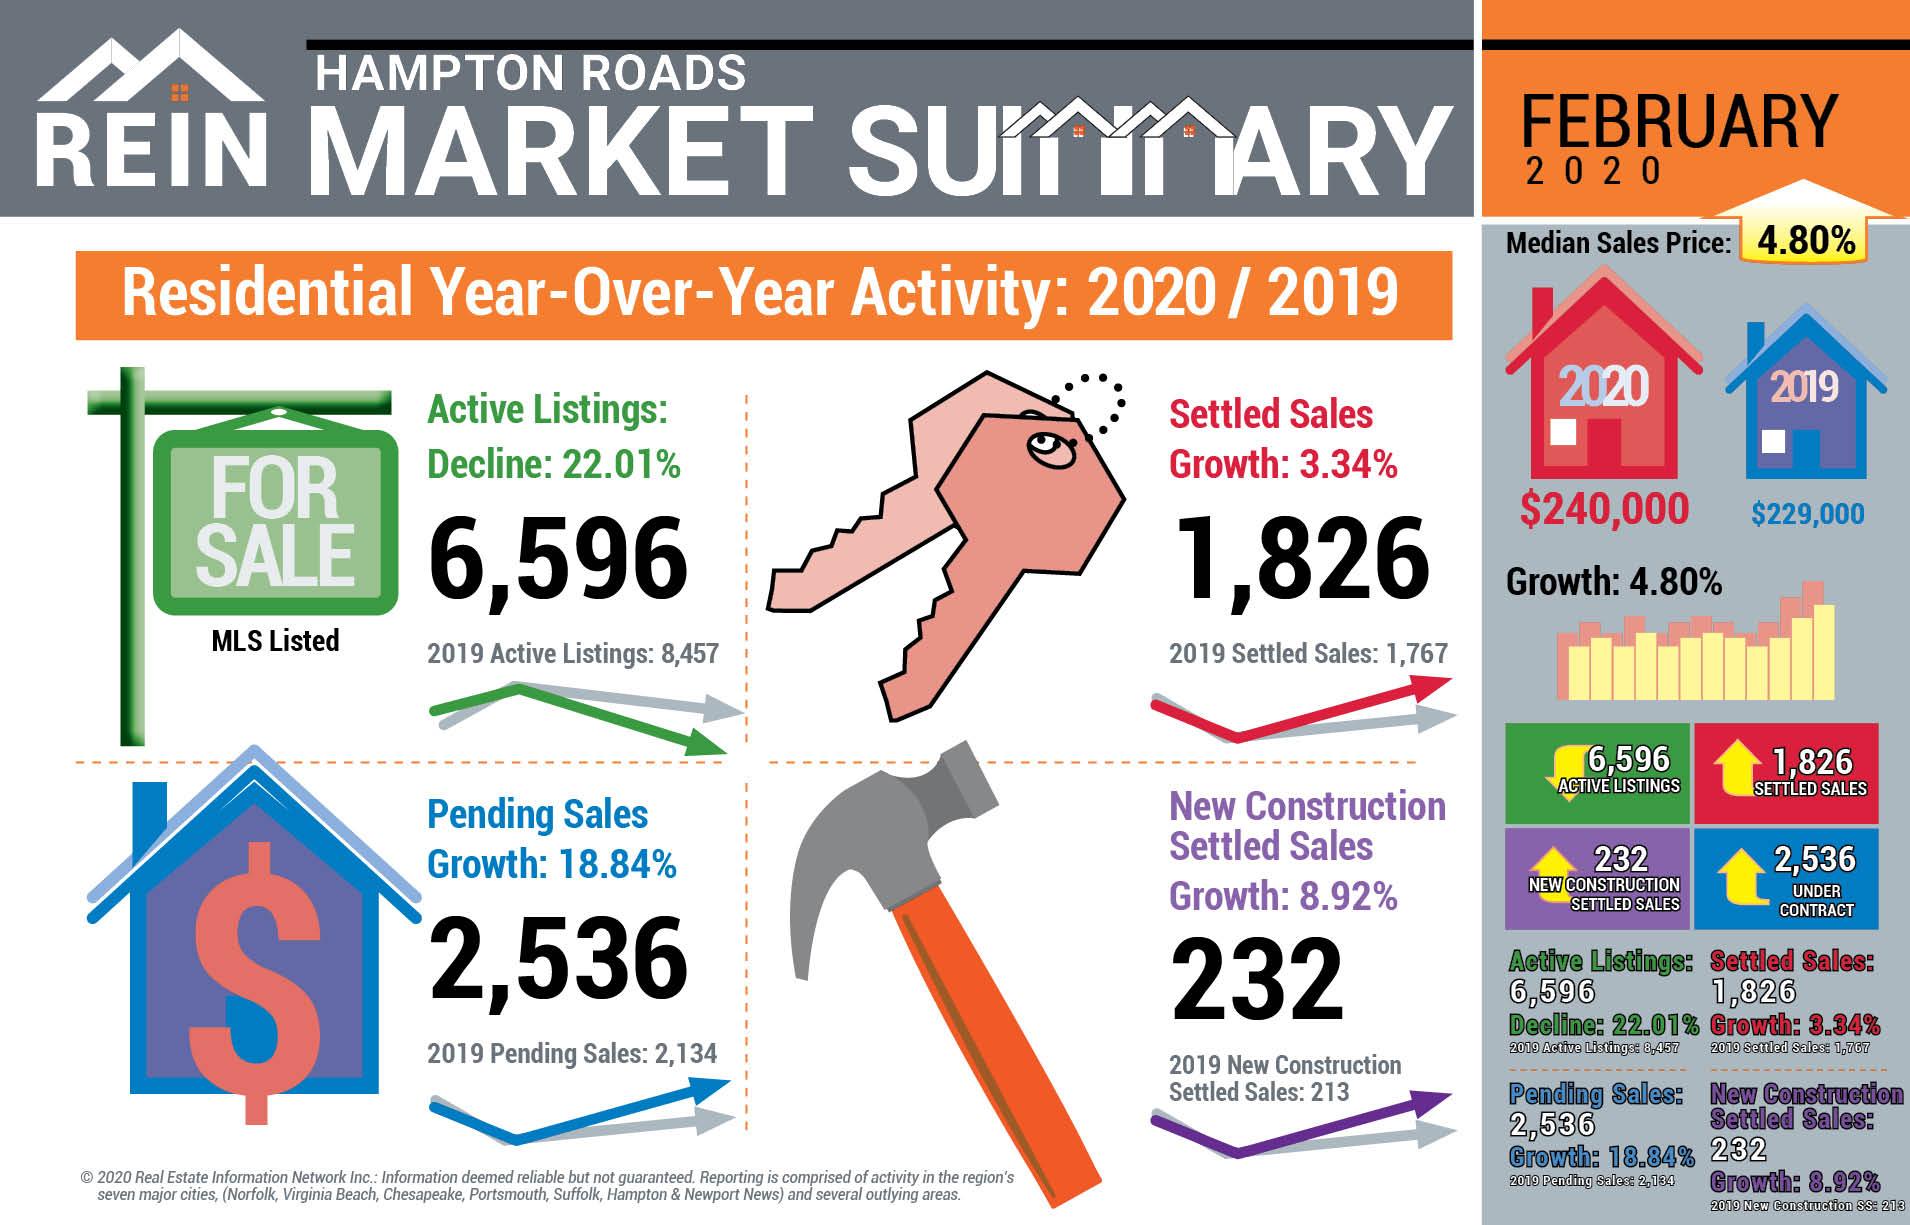 February 2020 Statistics Infographic